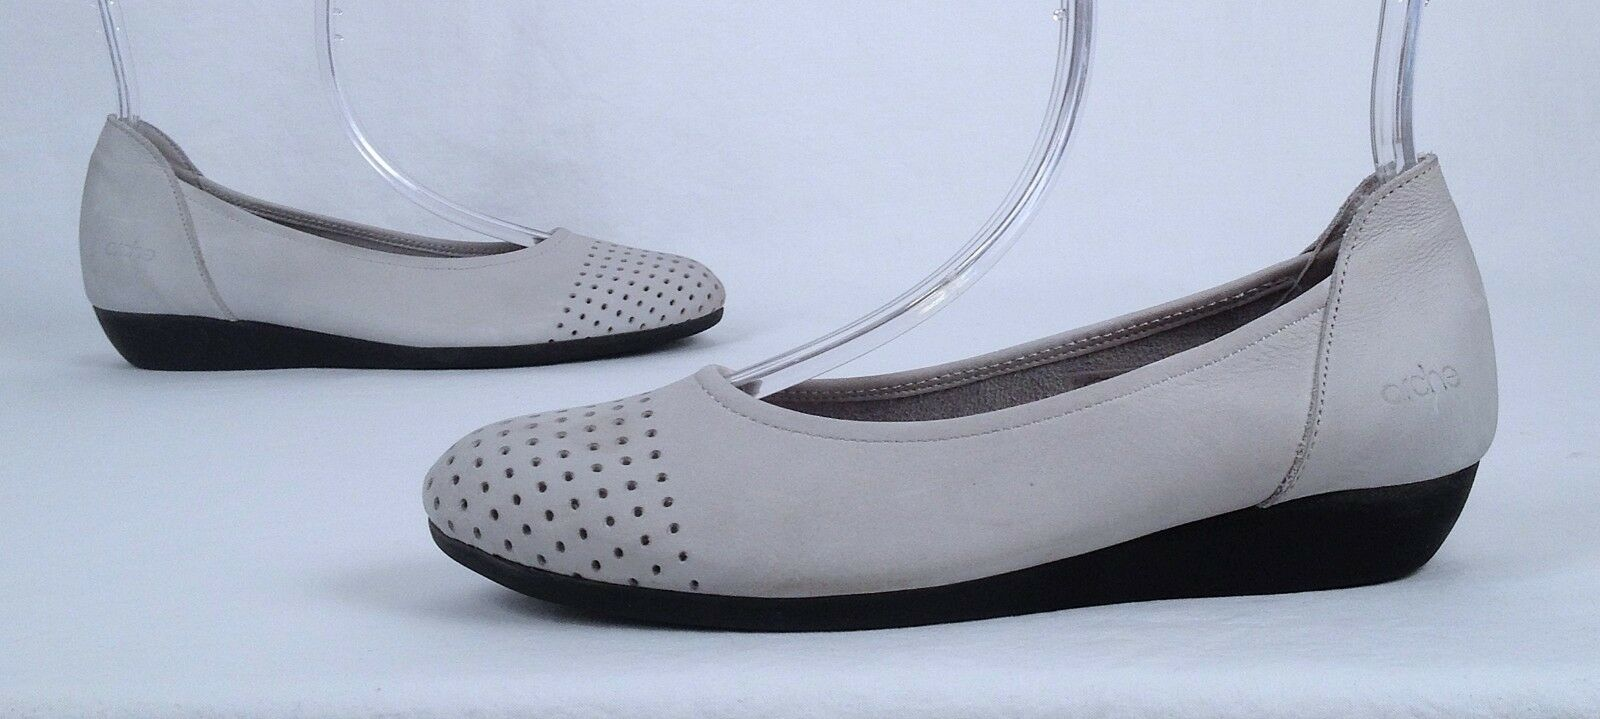 Arche 'onara' 'onara' 'onara' Flat-Brume-Talla 6 EE. UU. 37 UE  350 (P22)  excelentes precios